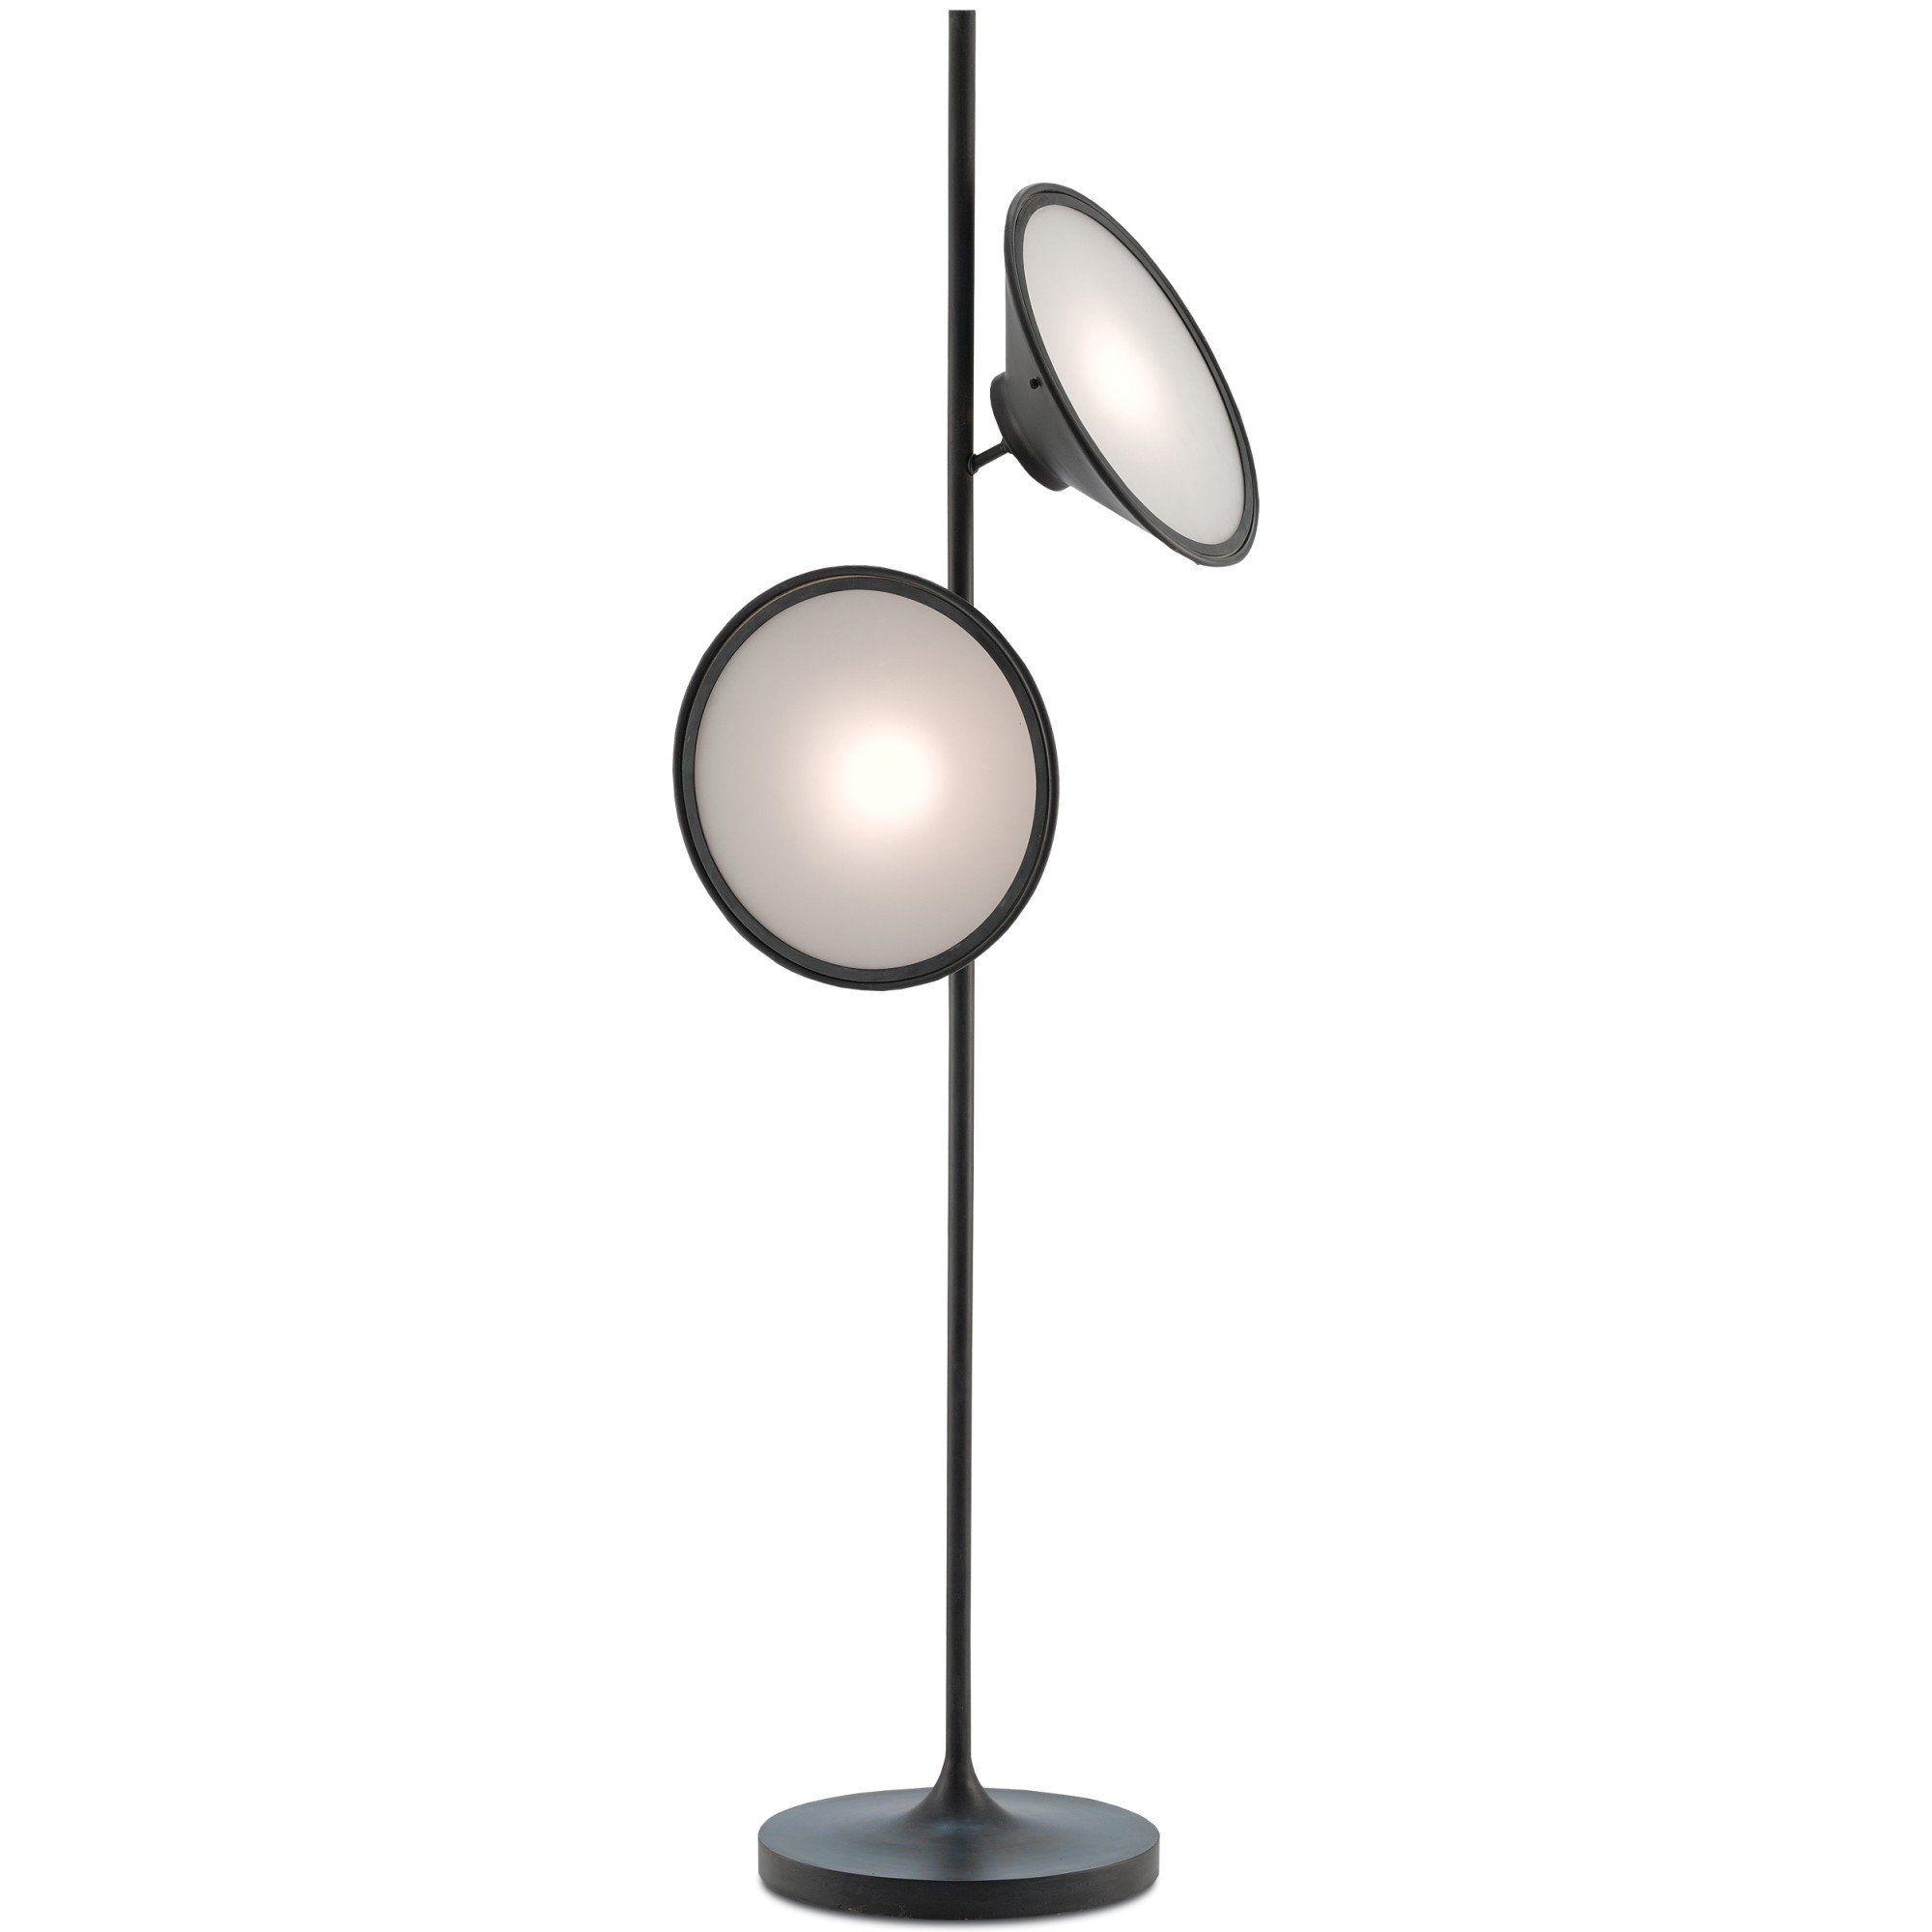 Bulat Floor Lamp Design By Currey Company Floor Lamp Floor Lamp Design Modern Floor Lamps